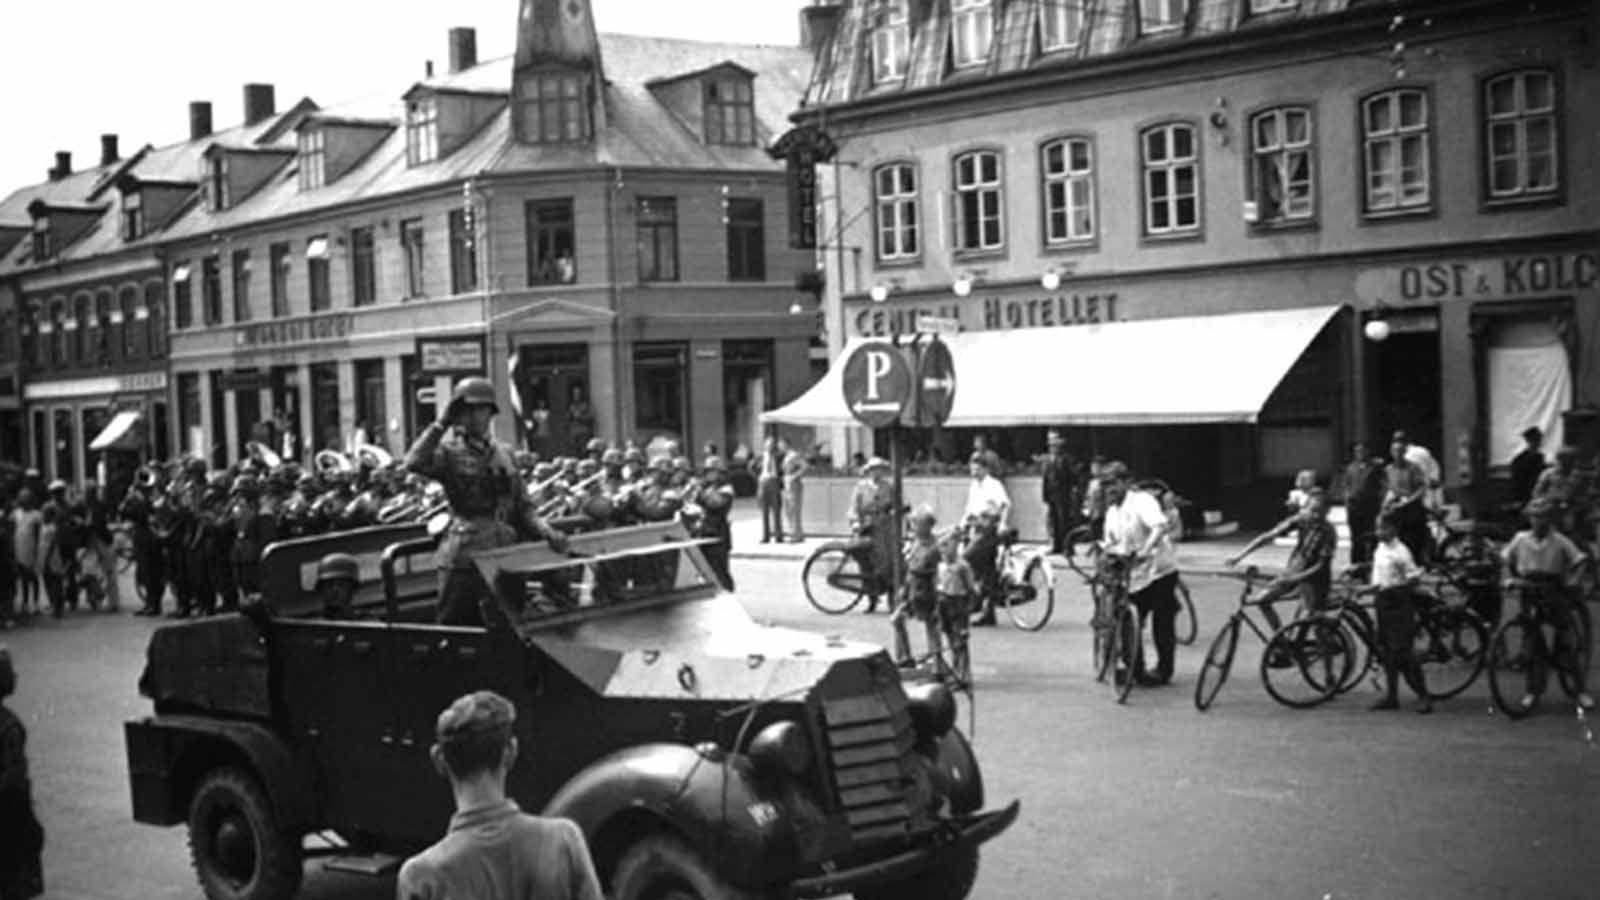 Ringsted befrielsen, 2. verdenskrig